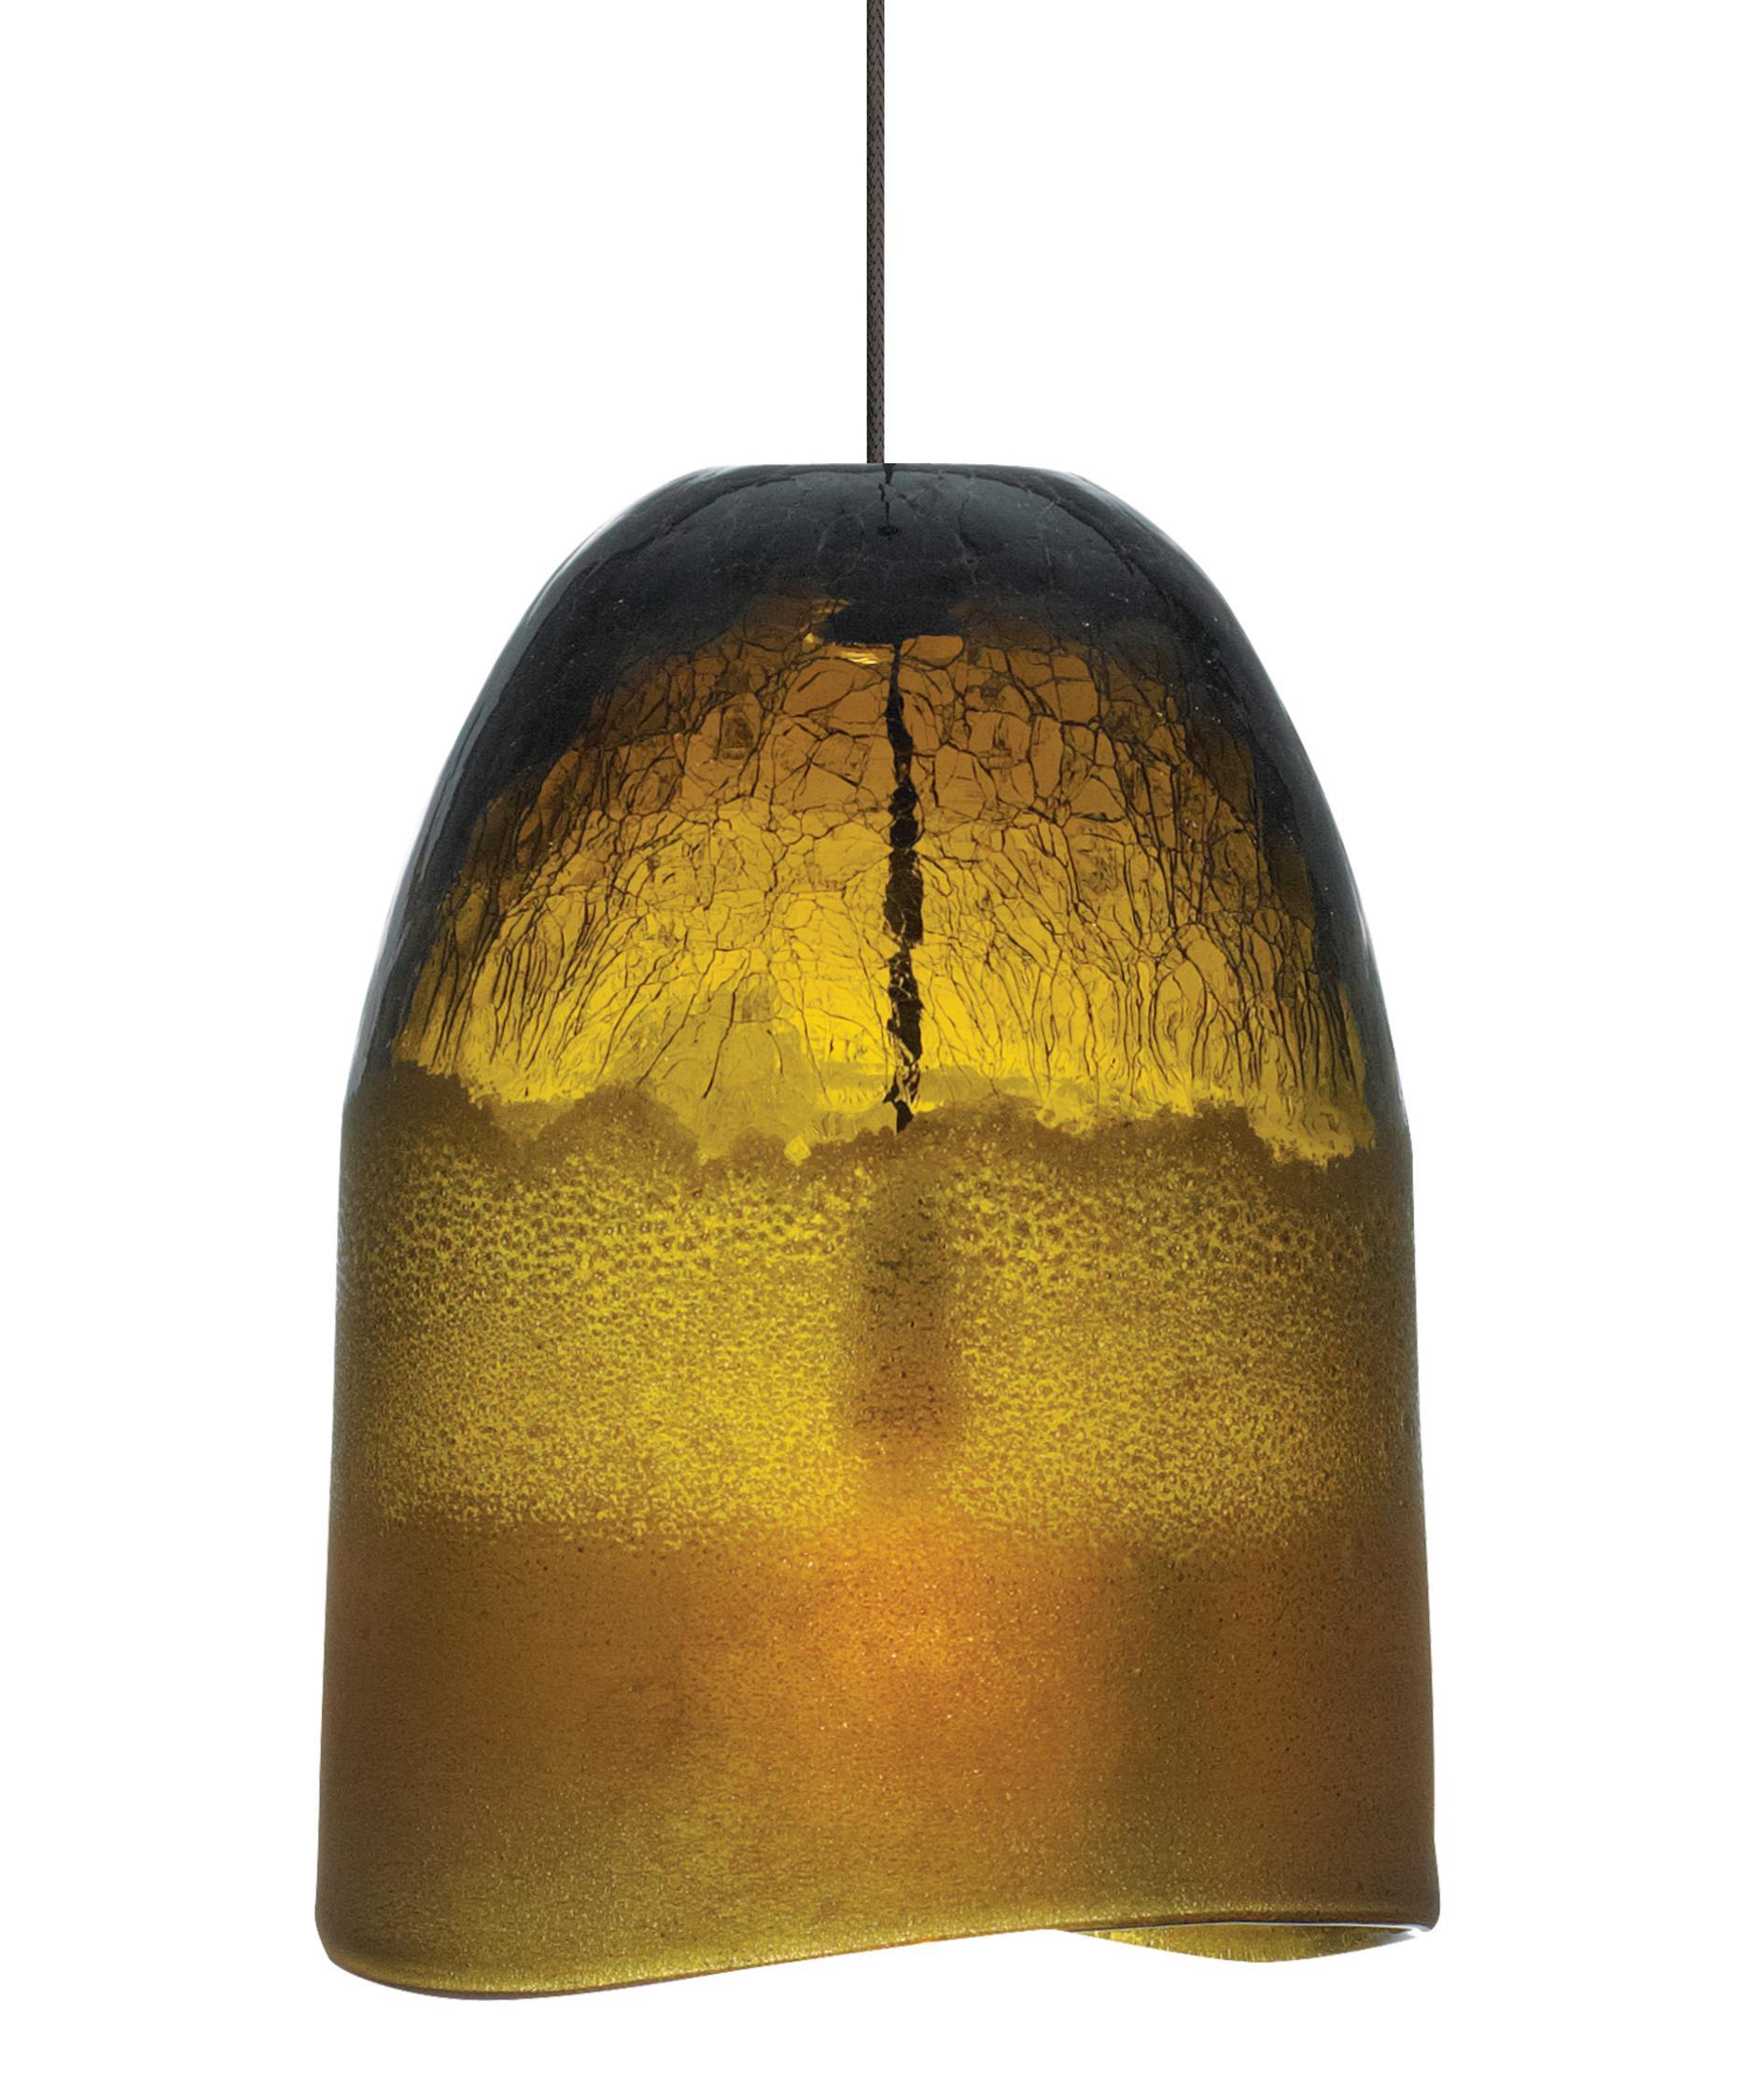 amber pendant lighting. shown with amber glass pendant lighting g